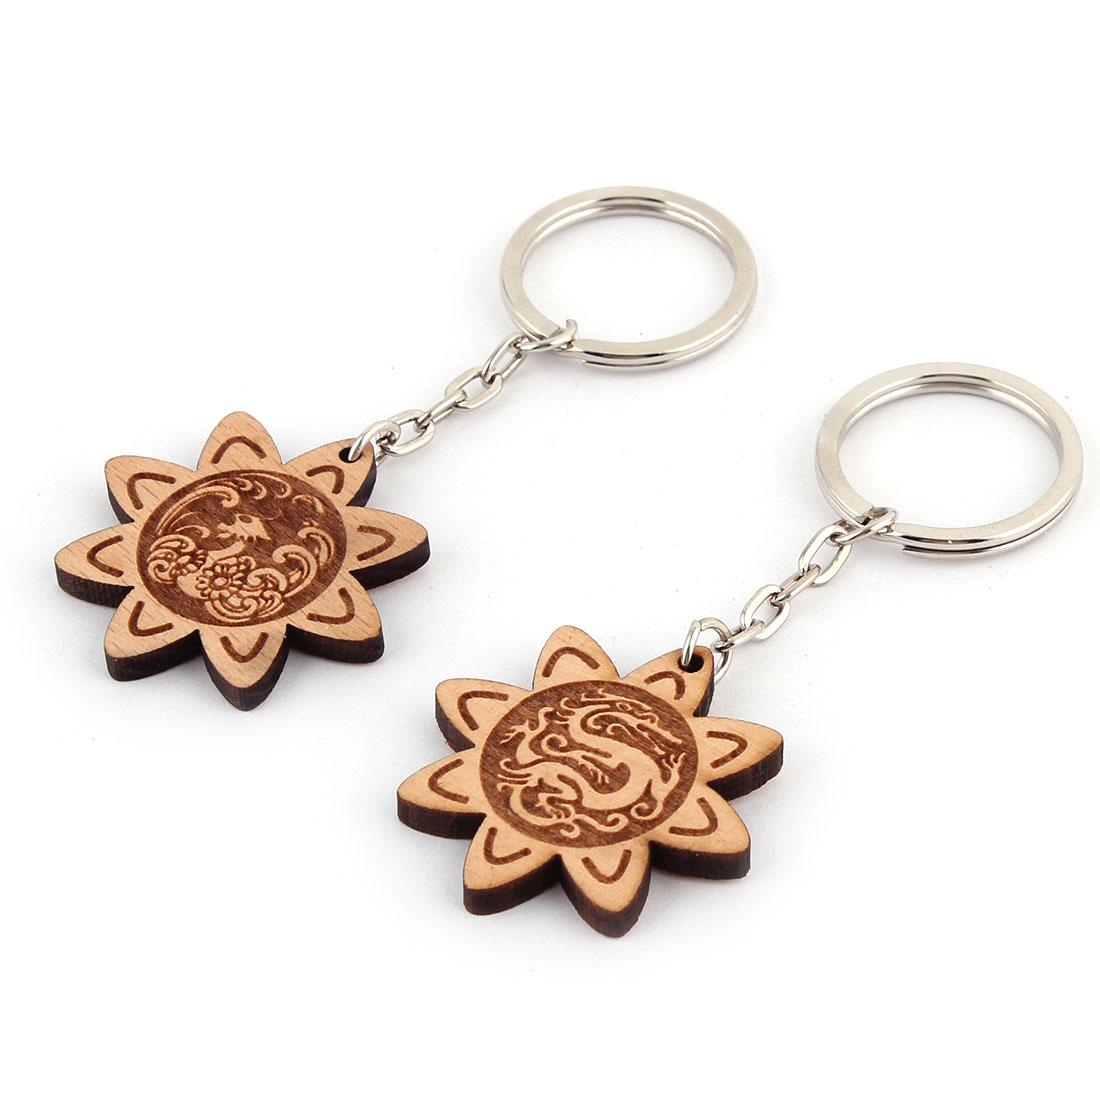 Metal Portable ClampDetailing Pendant Keyring Keychain Ornament 2pcs